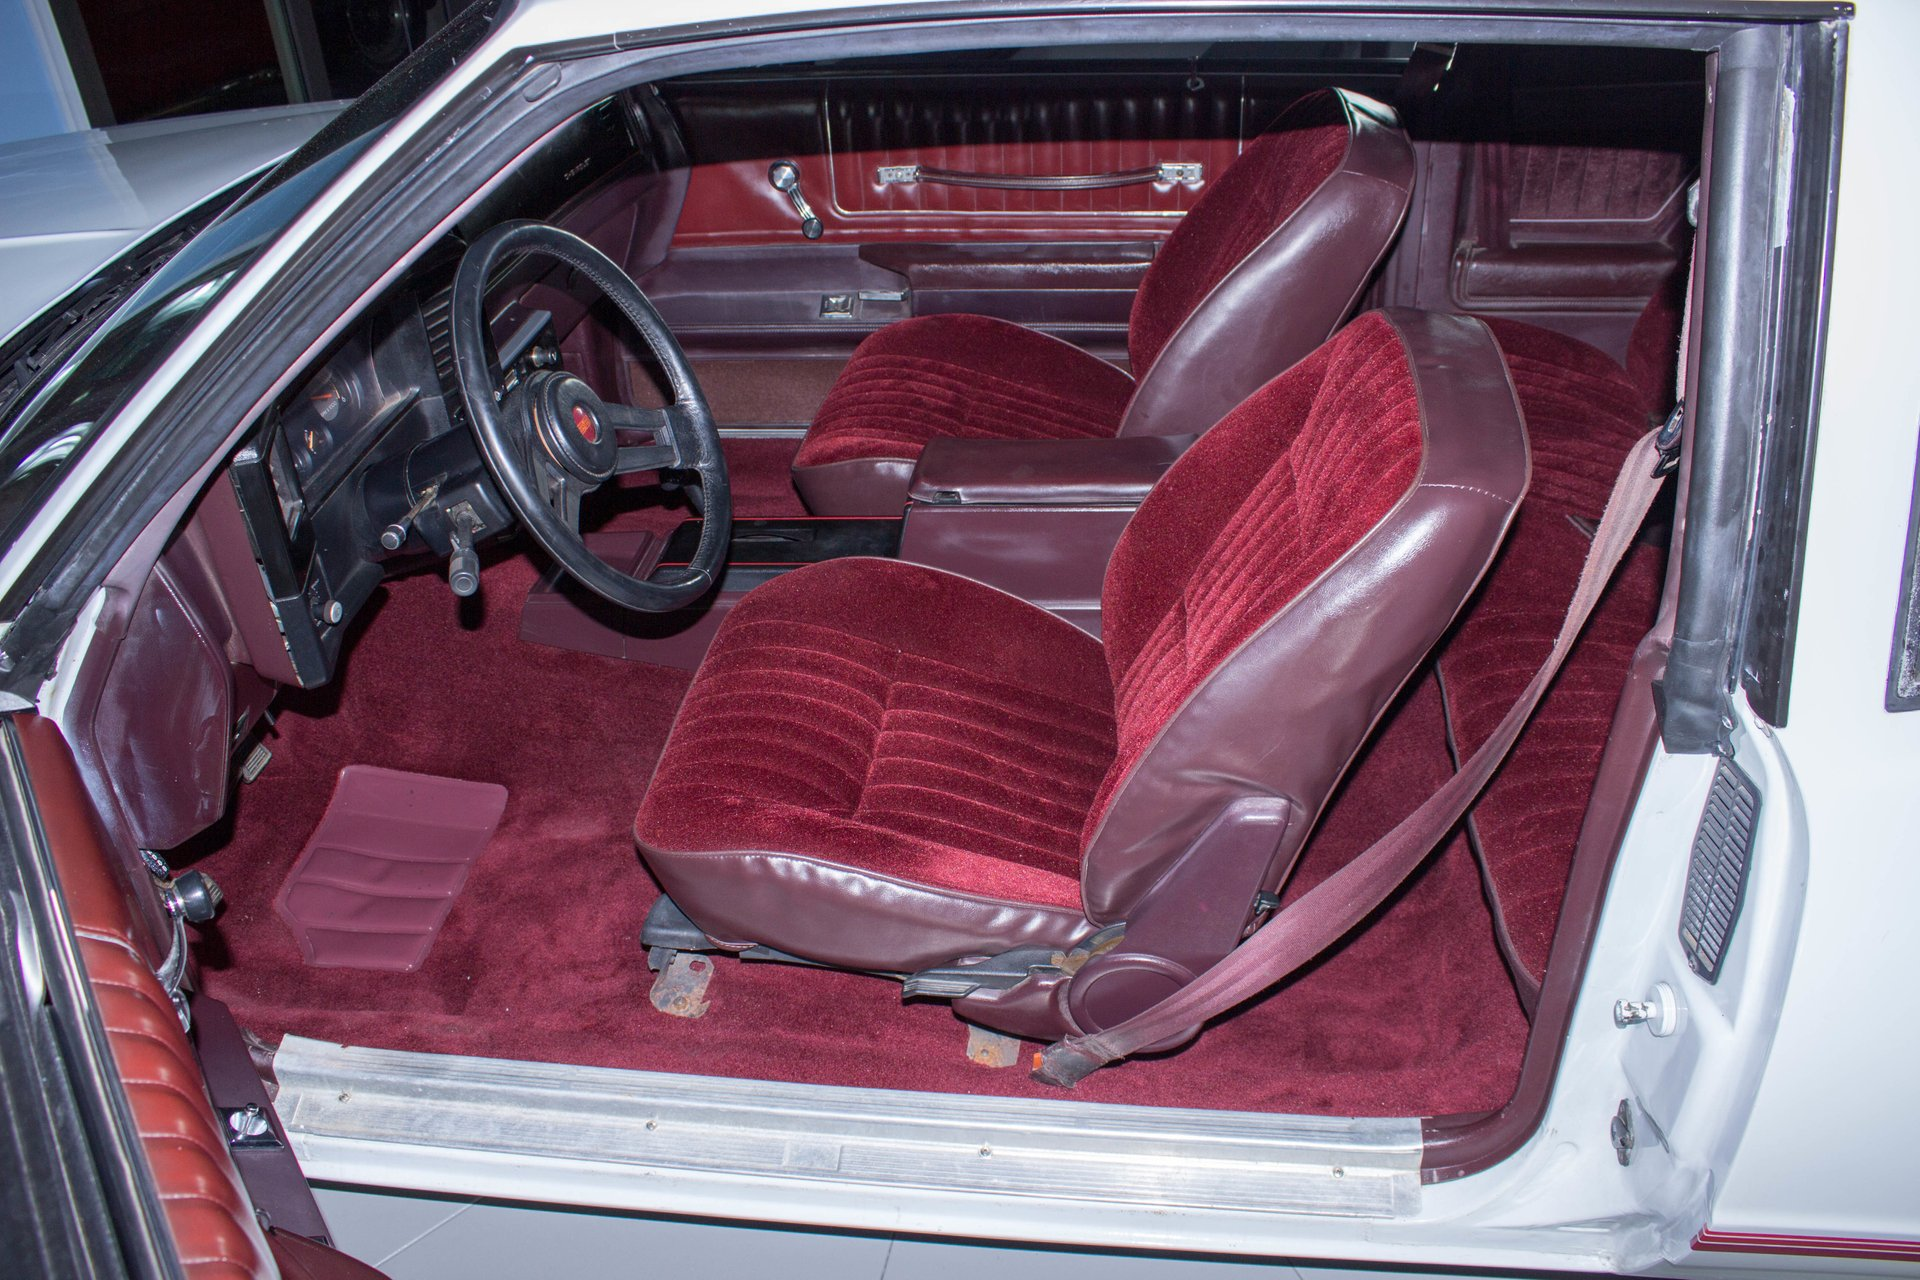 1987 Chevrolet Monte Carlo SS Aero   Classic Cars & Used